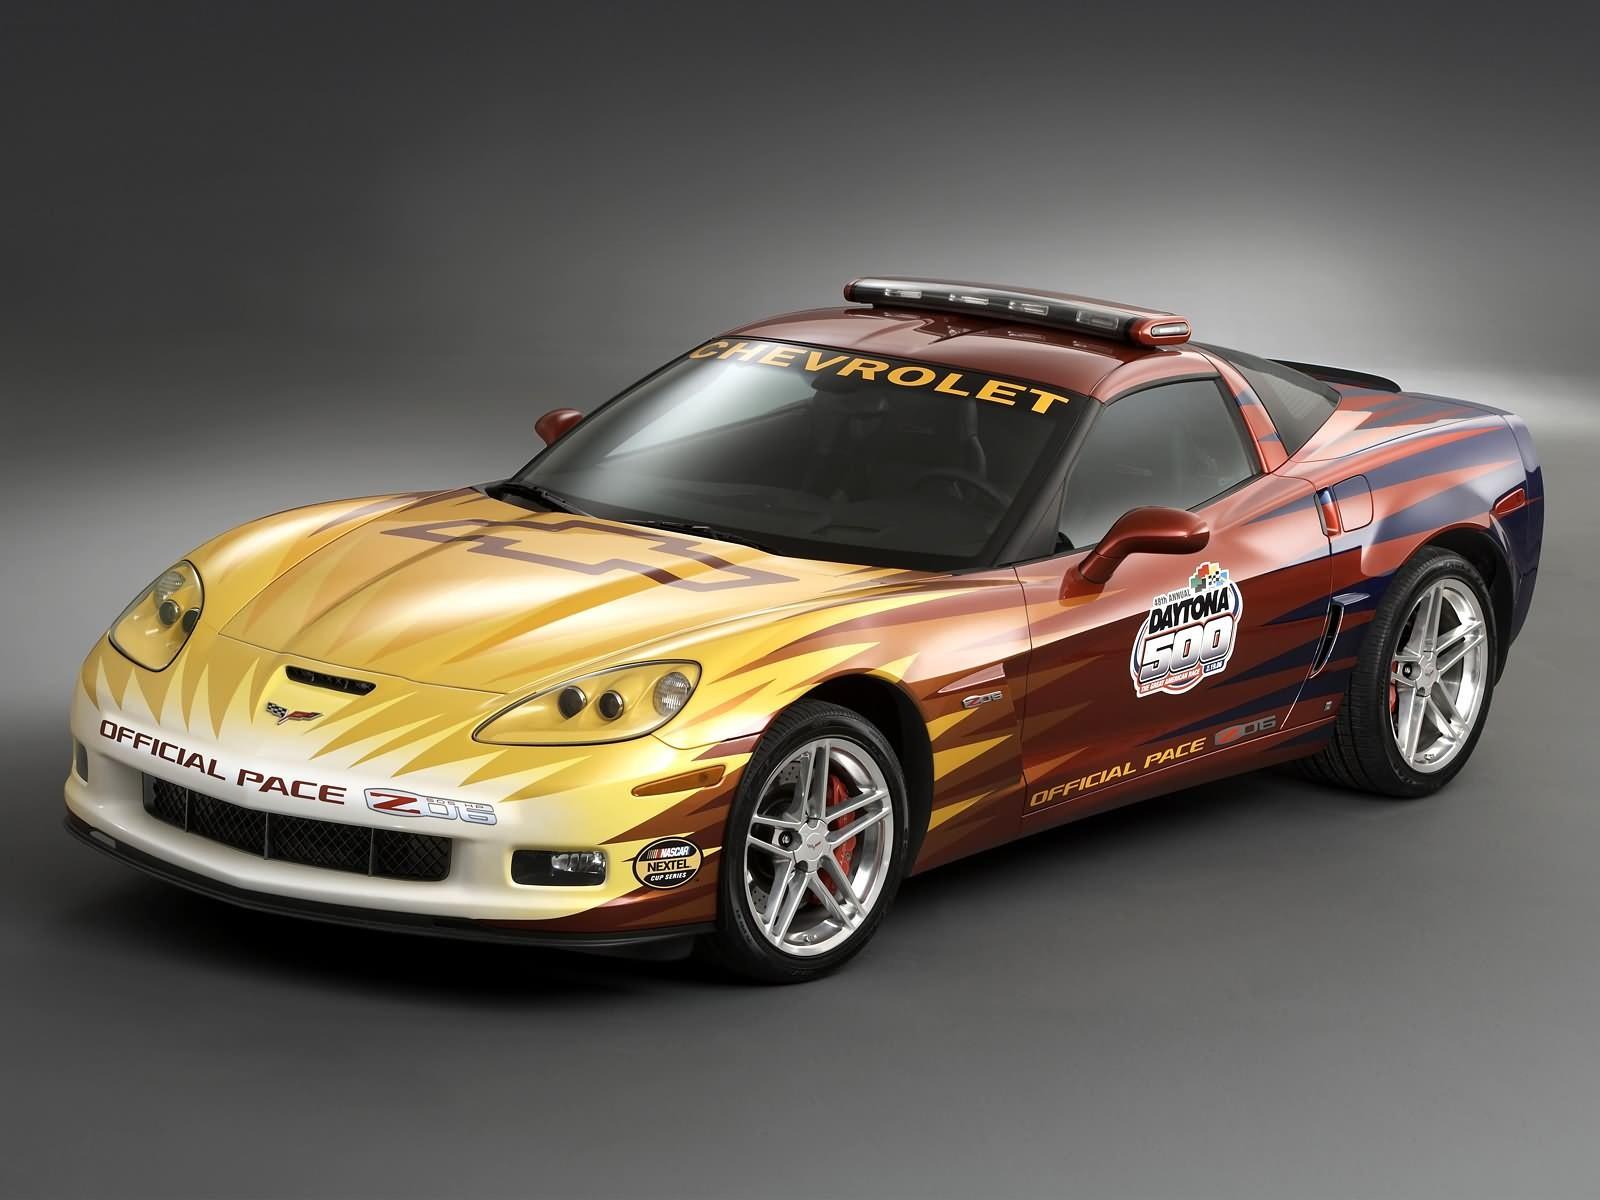 Chevrolet Corvette Z06 Fondo de pantalla del Wallpaper For Background